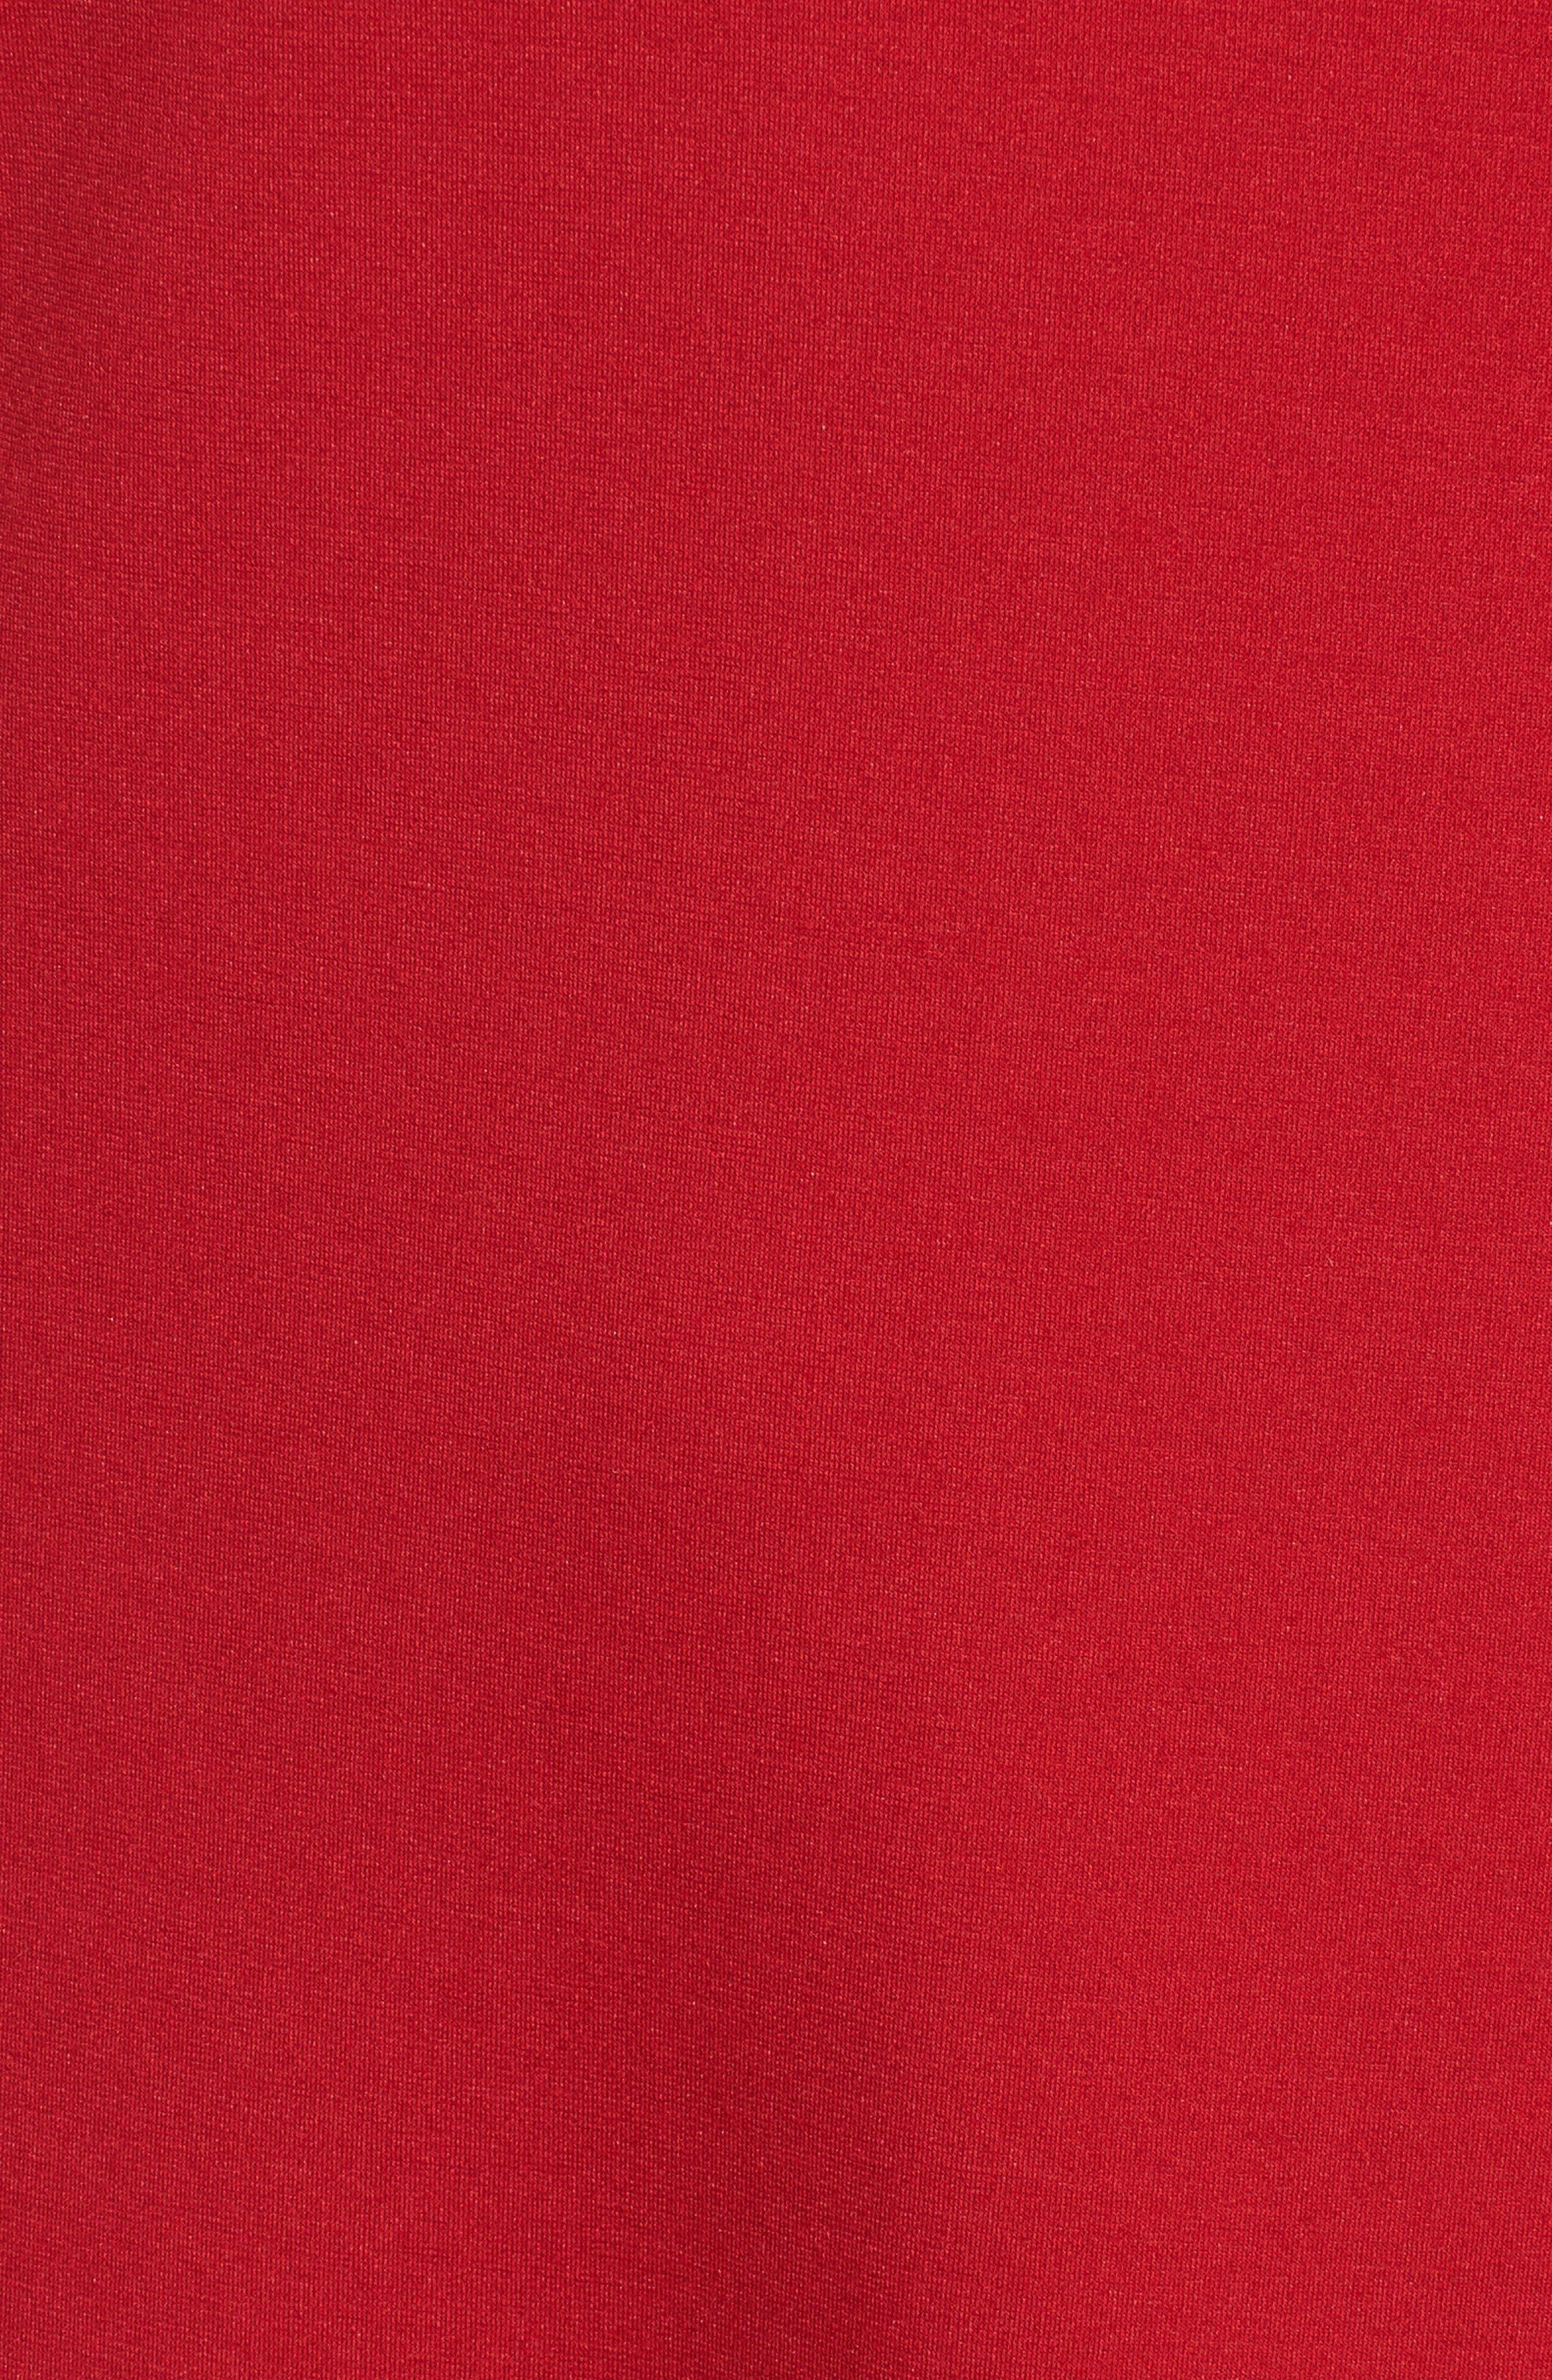 Alternate Image 5  - Halogen Ruffle Shift Dress (Regular & Petite)